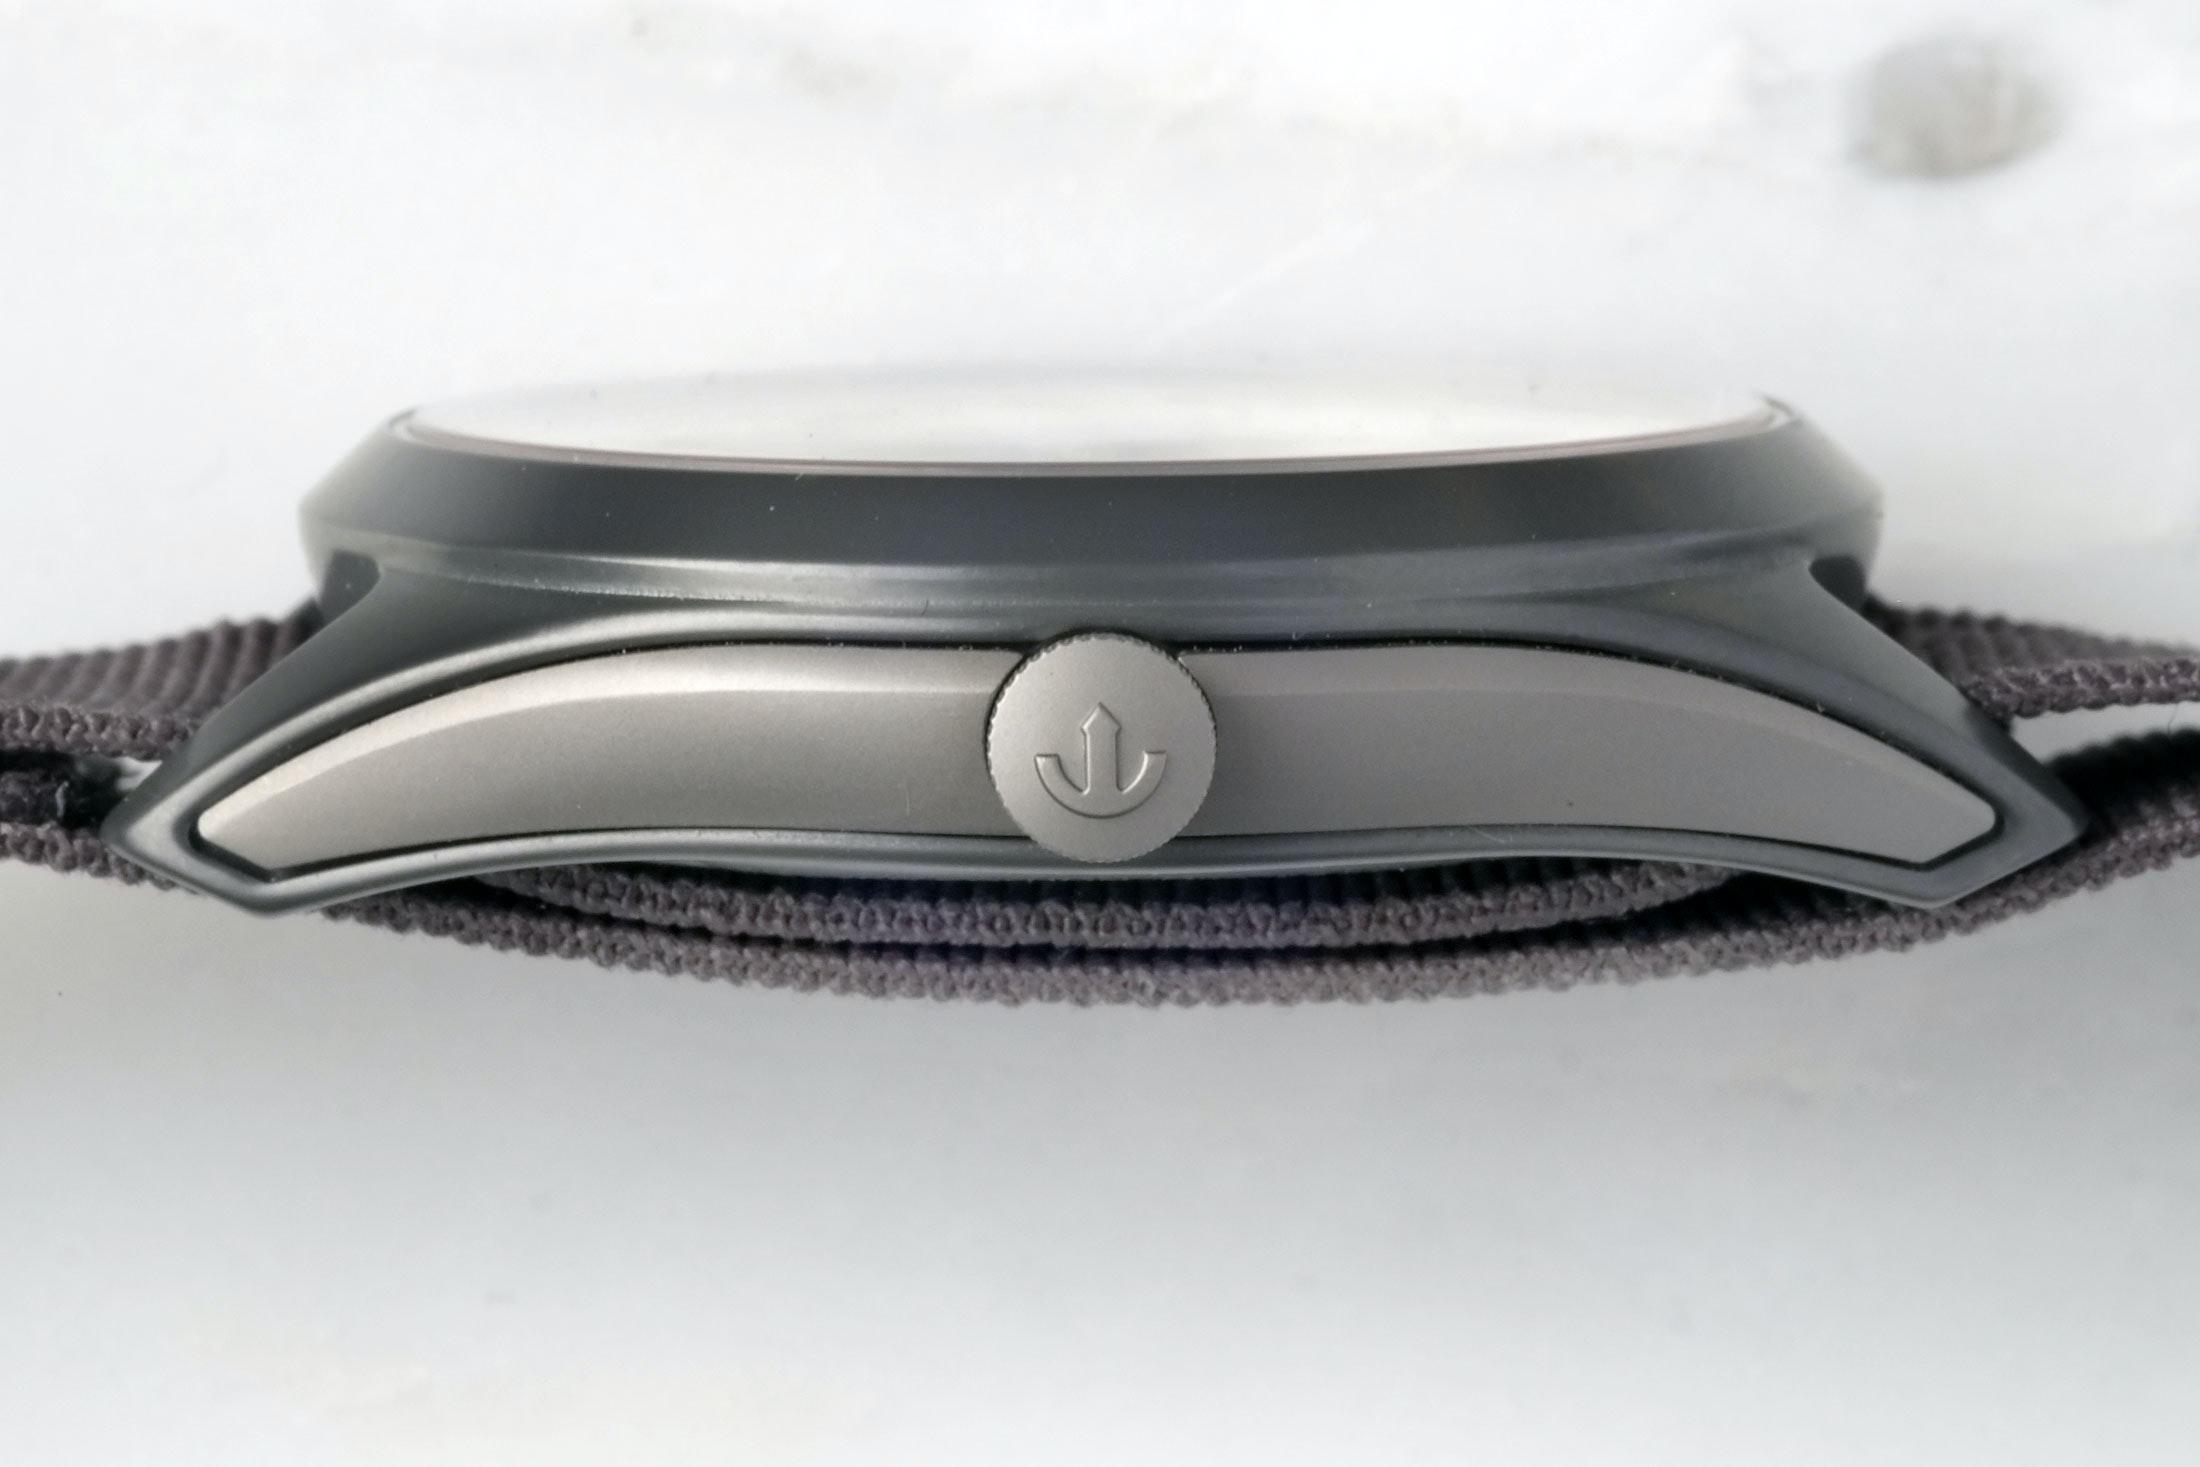 rado hyperchrome ultra light hodinkee A Week On The Wrist: The Rado HyperChrome Ultra Light A Week On The Wrist: The Rado HyperChrome Ultra Light rado ultralight 15